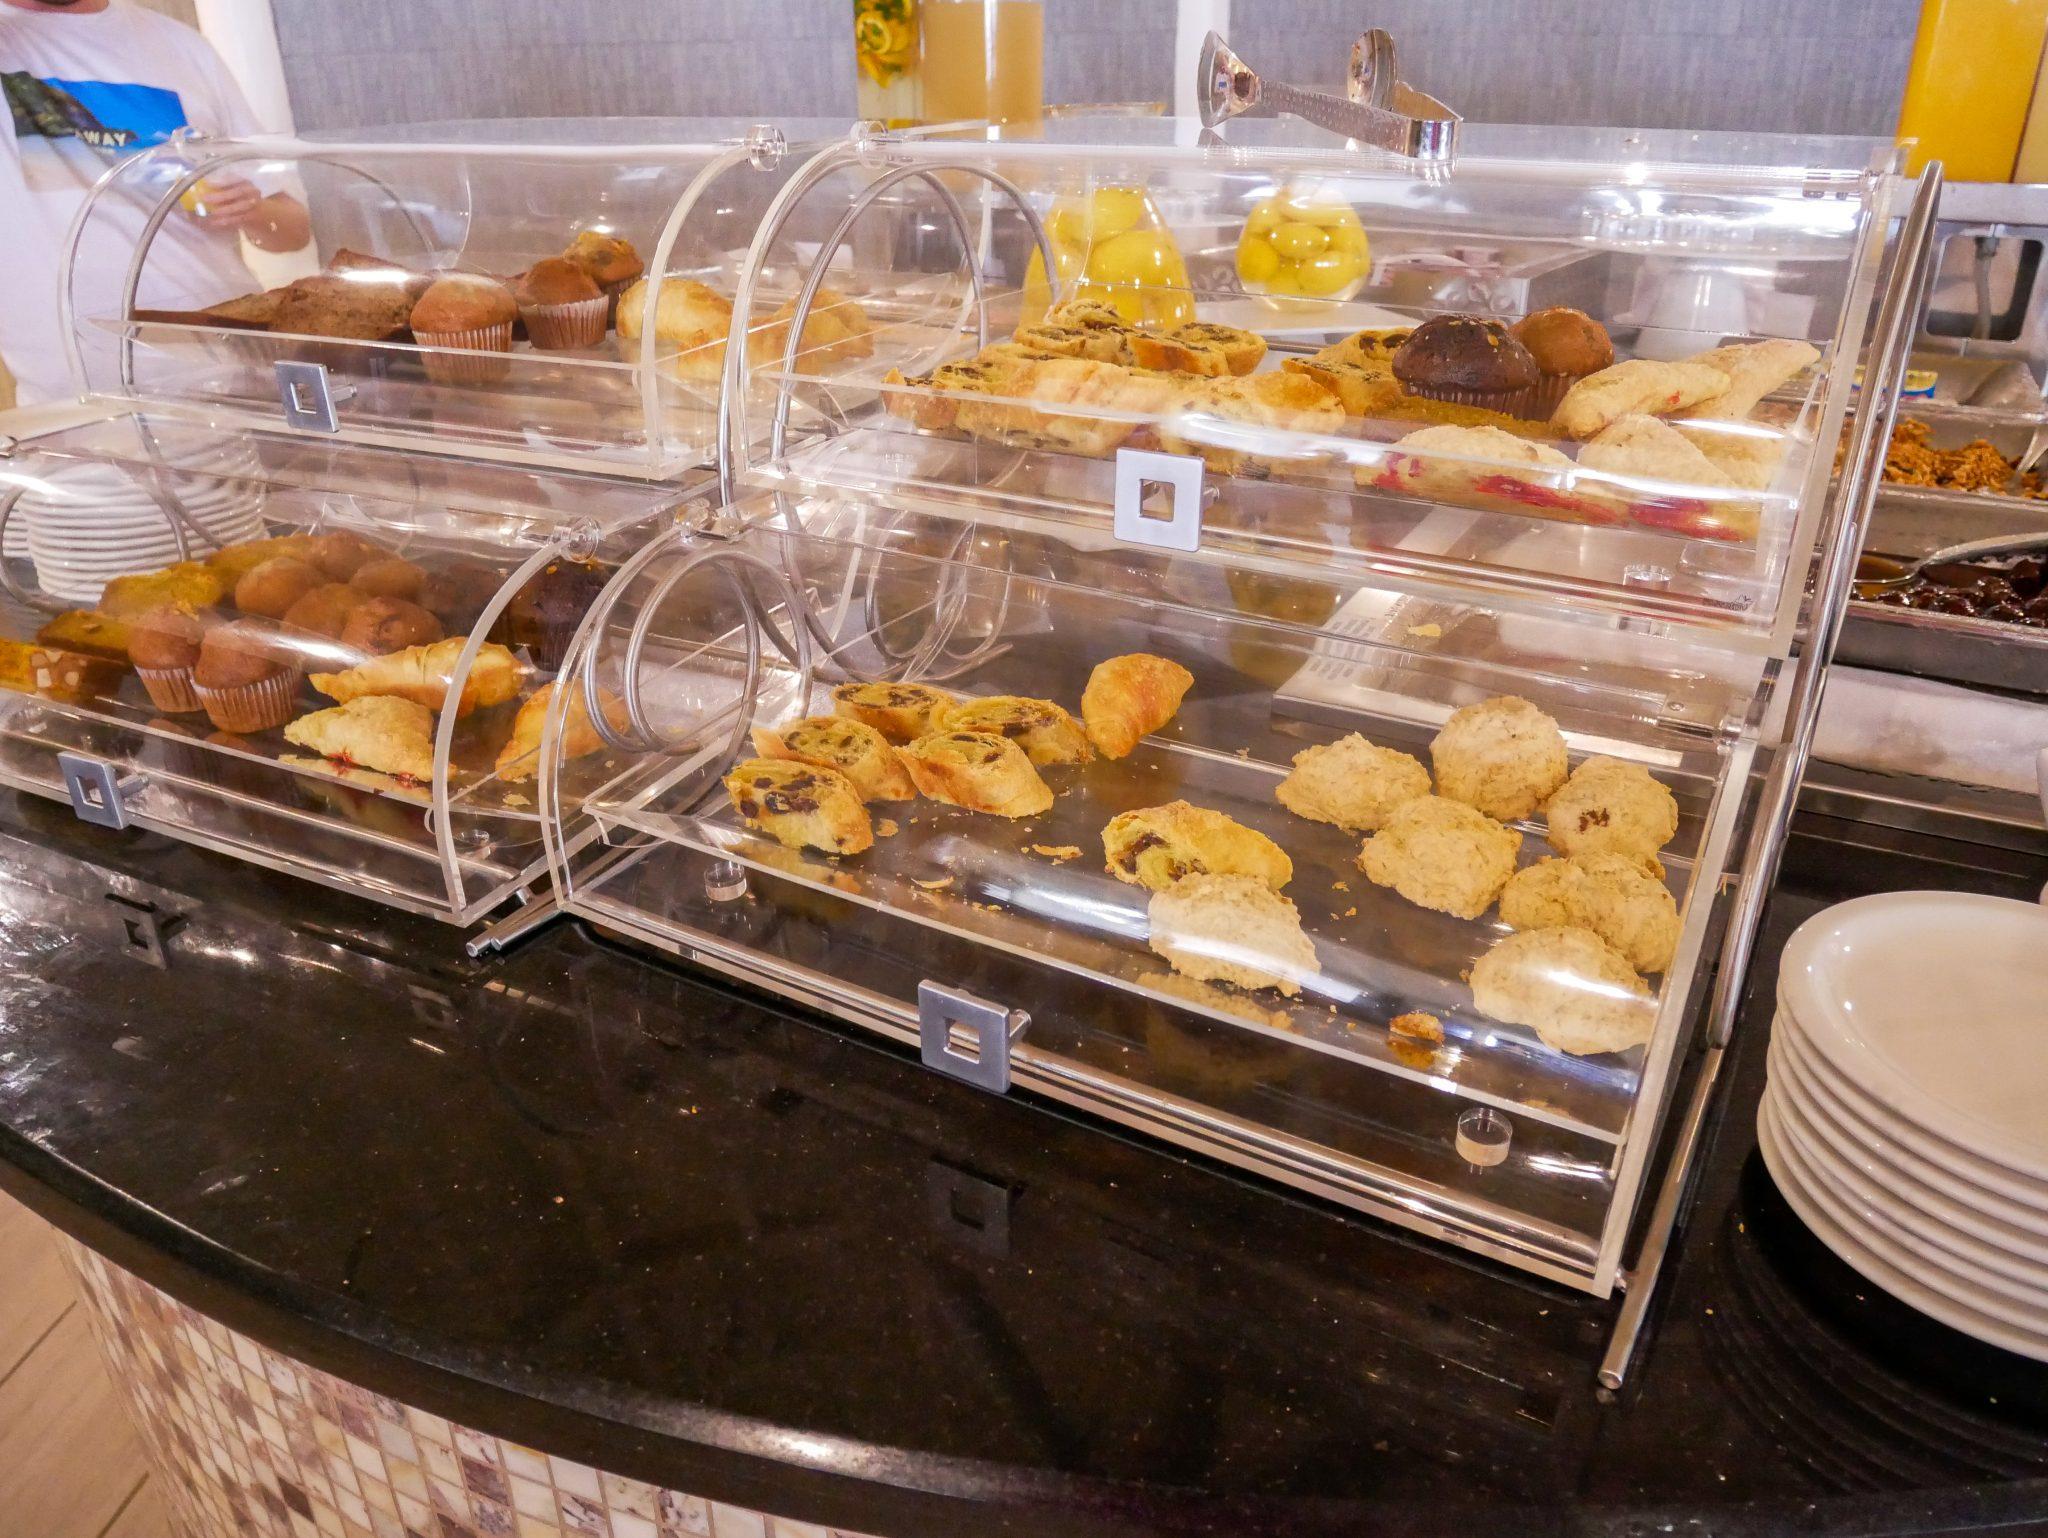 Breakfast pastries in their clear bread bins